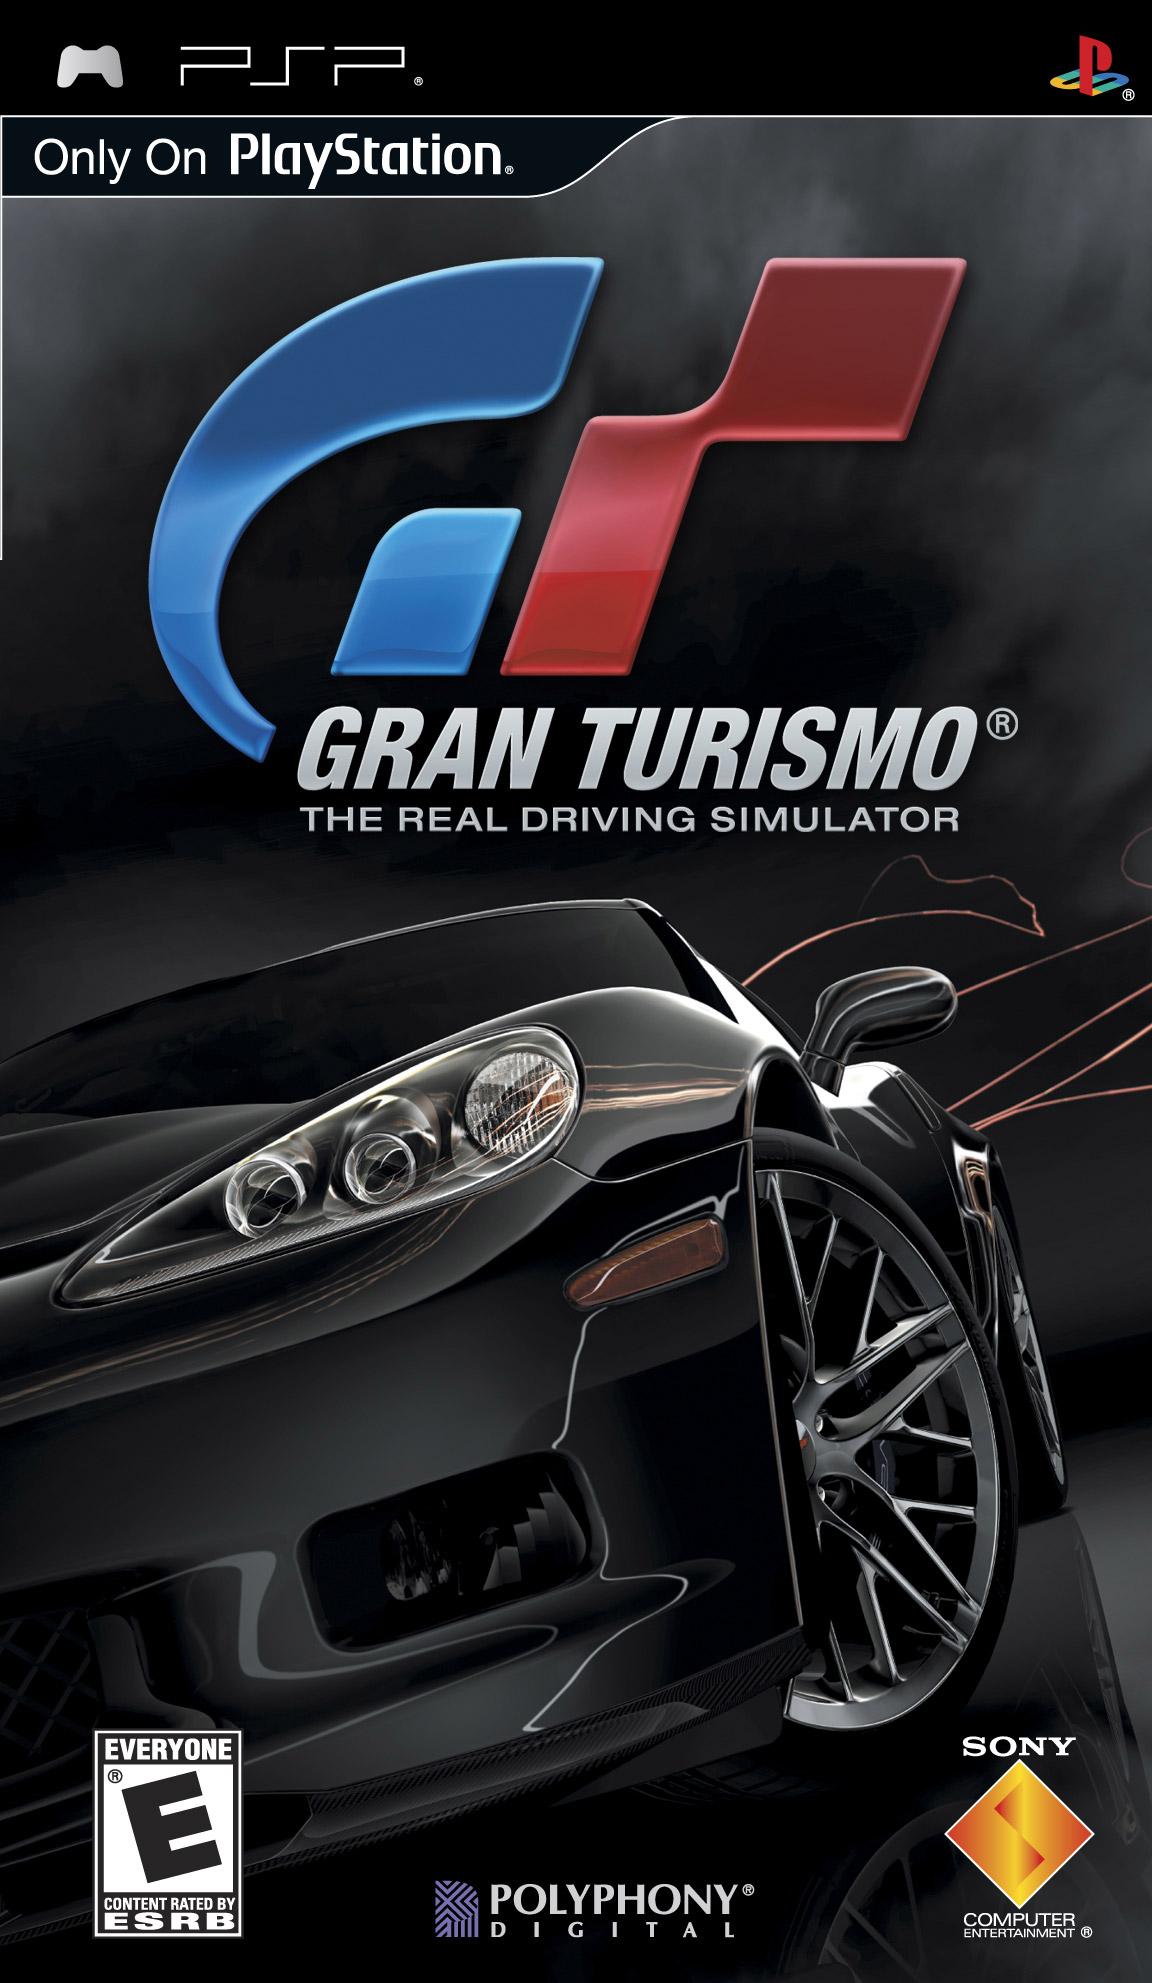 Gran Turismo (PlayStation Portable game) | Gran Turismo ...